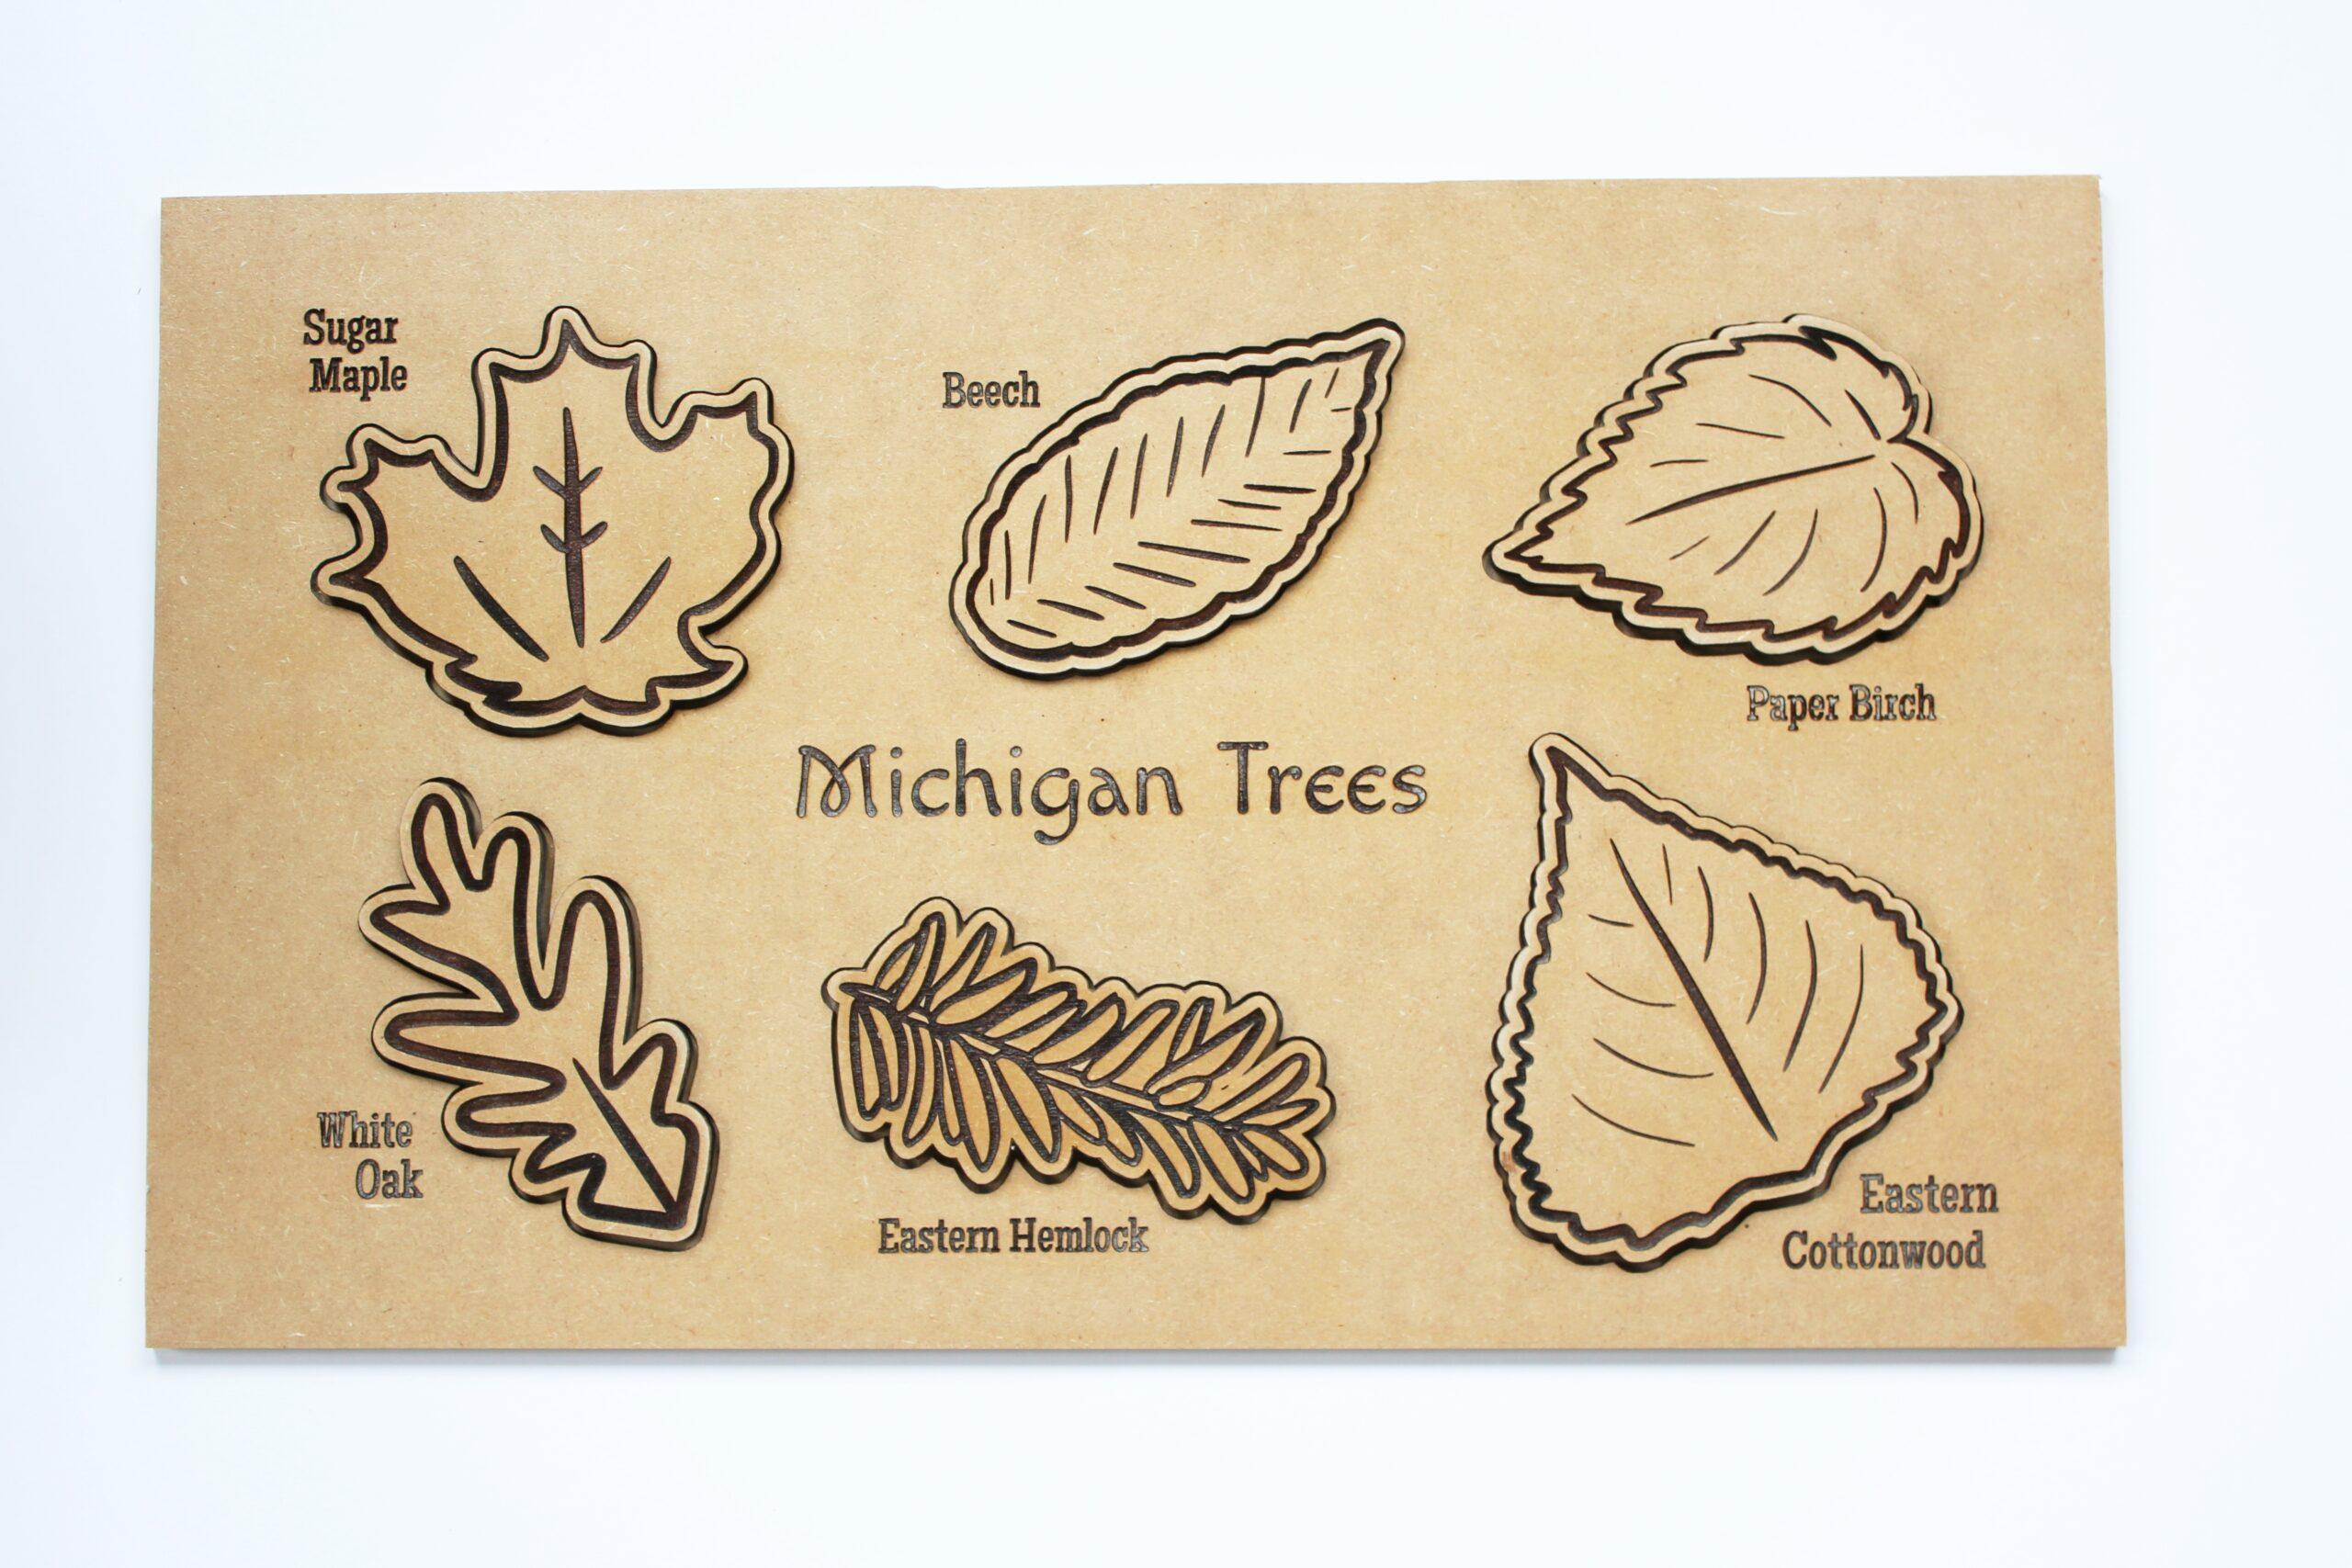 Sensory Box Family Wooden Michigan Tree Leaf Puzzle